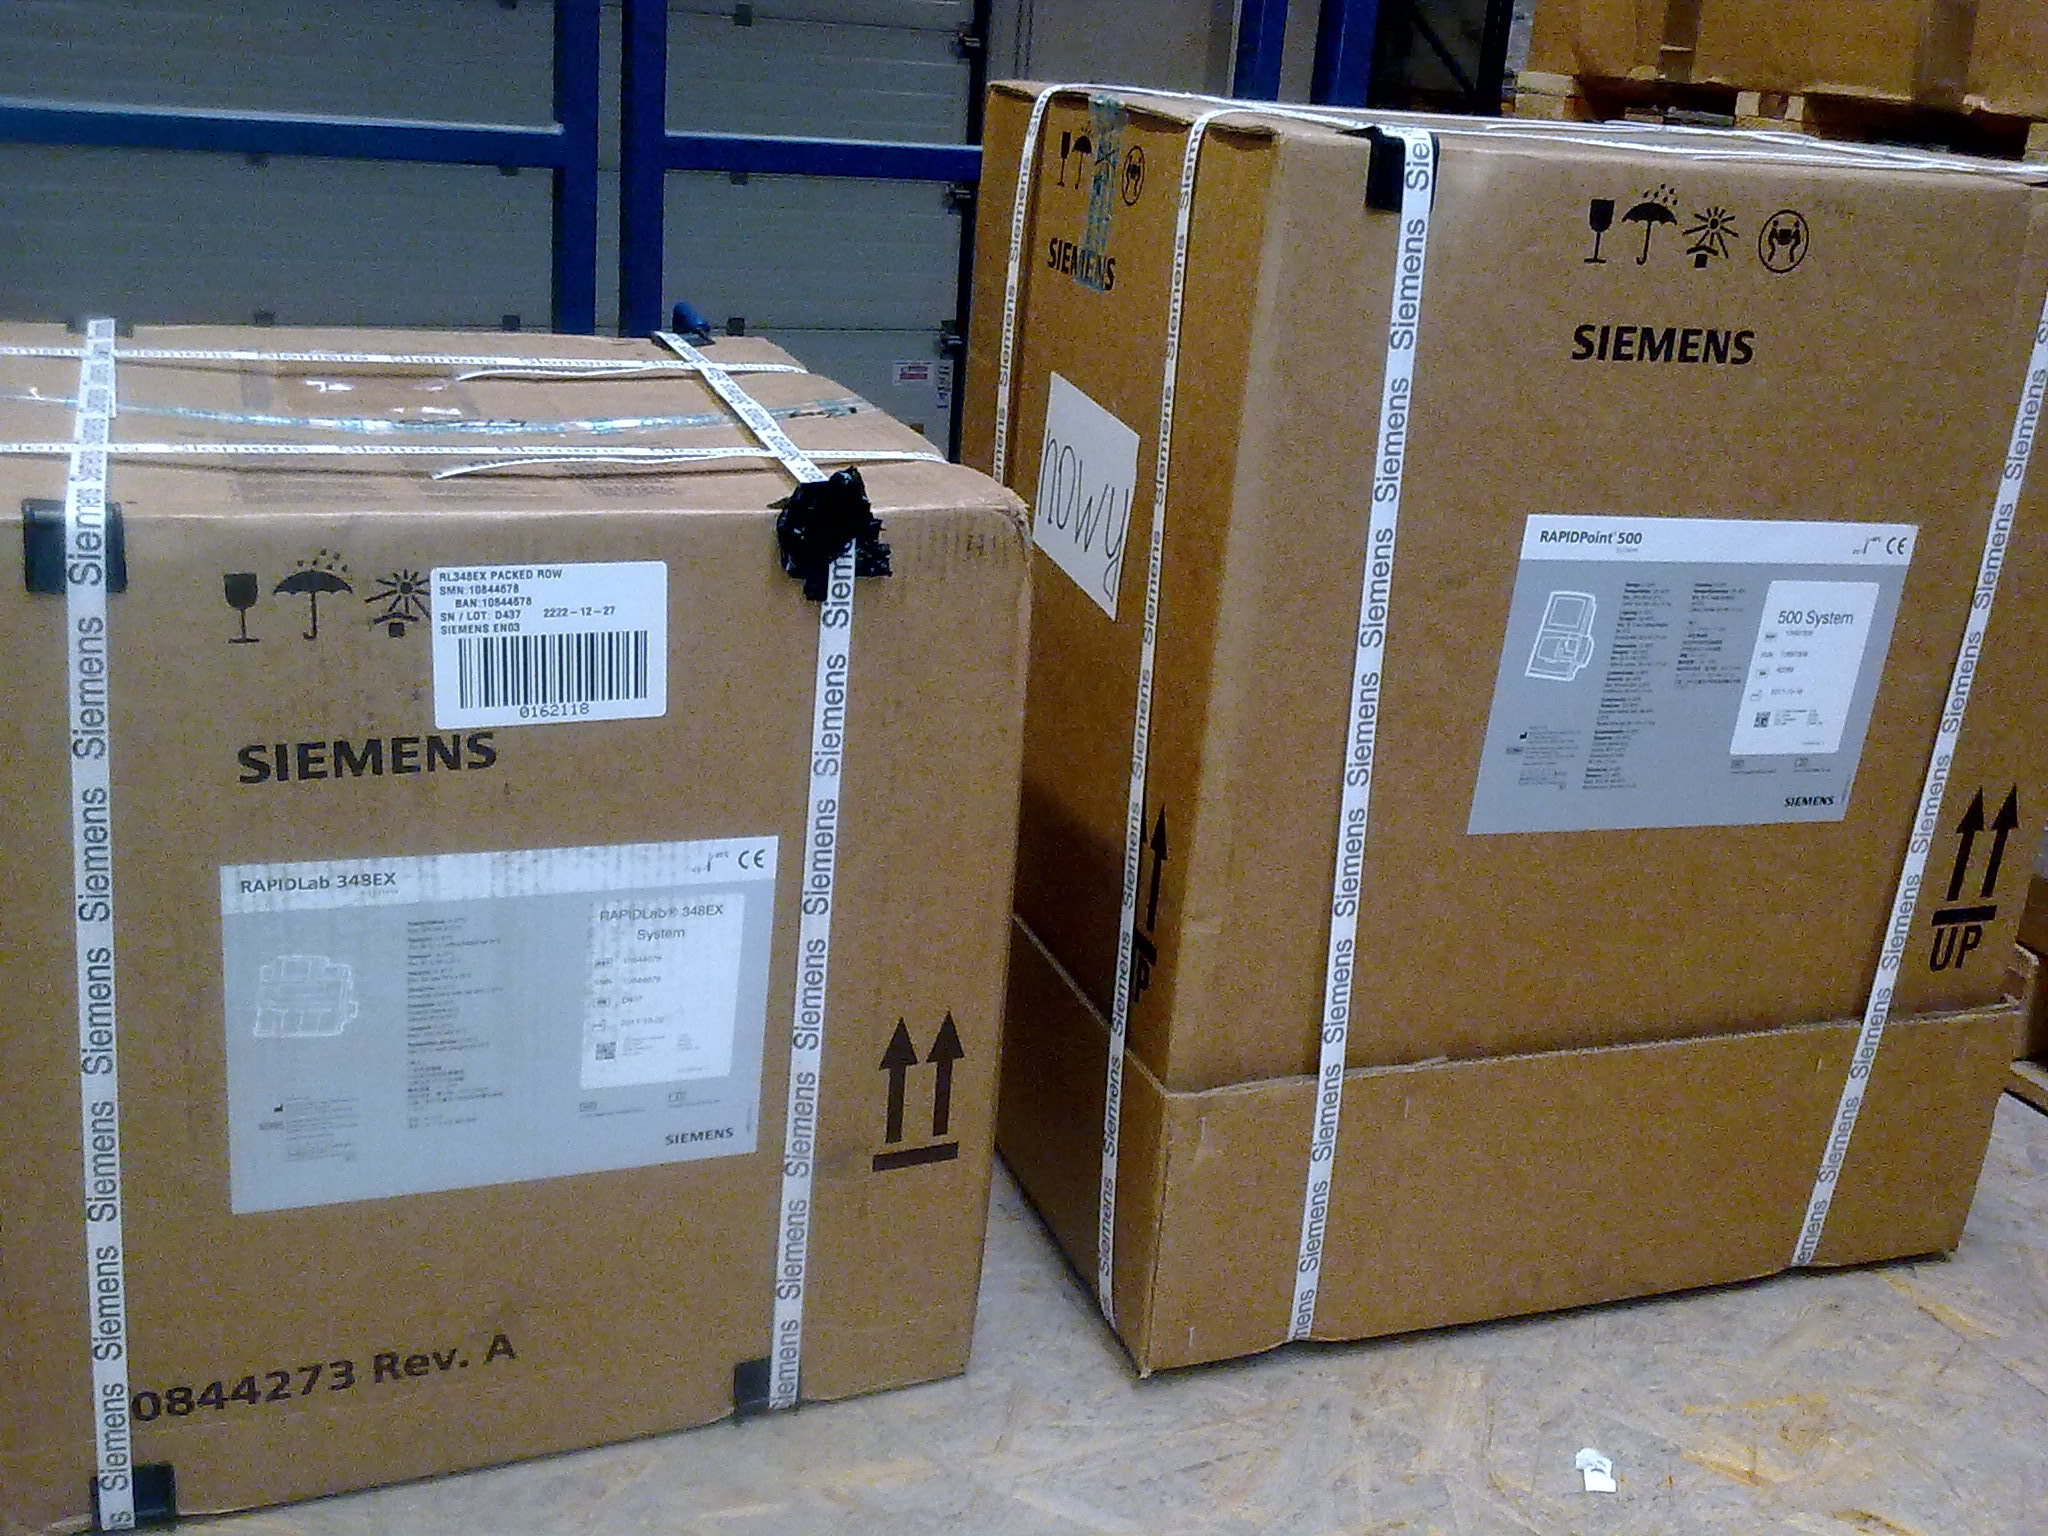 CE Power24 Vampyr CE Serie AEG-Electrolux Vampyr Ace 4120 MohMus 10 Premium Bolsas de Aspiradora para AEG CE 2000 Gr/ö/ße 28